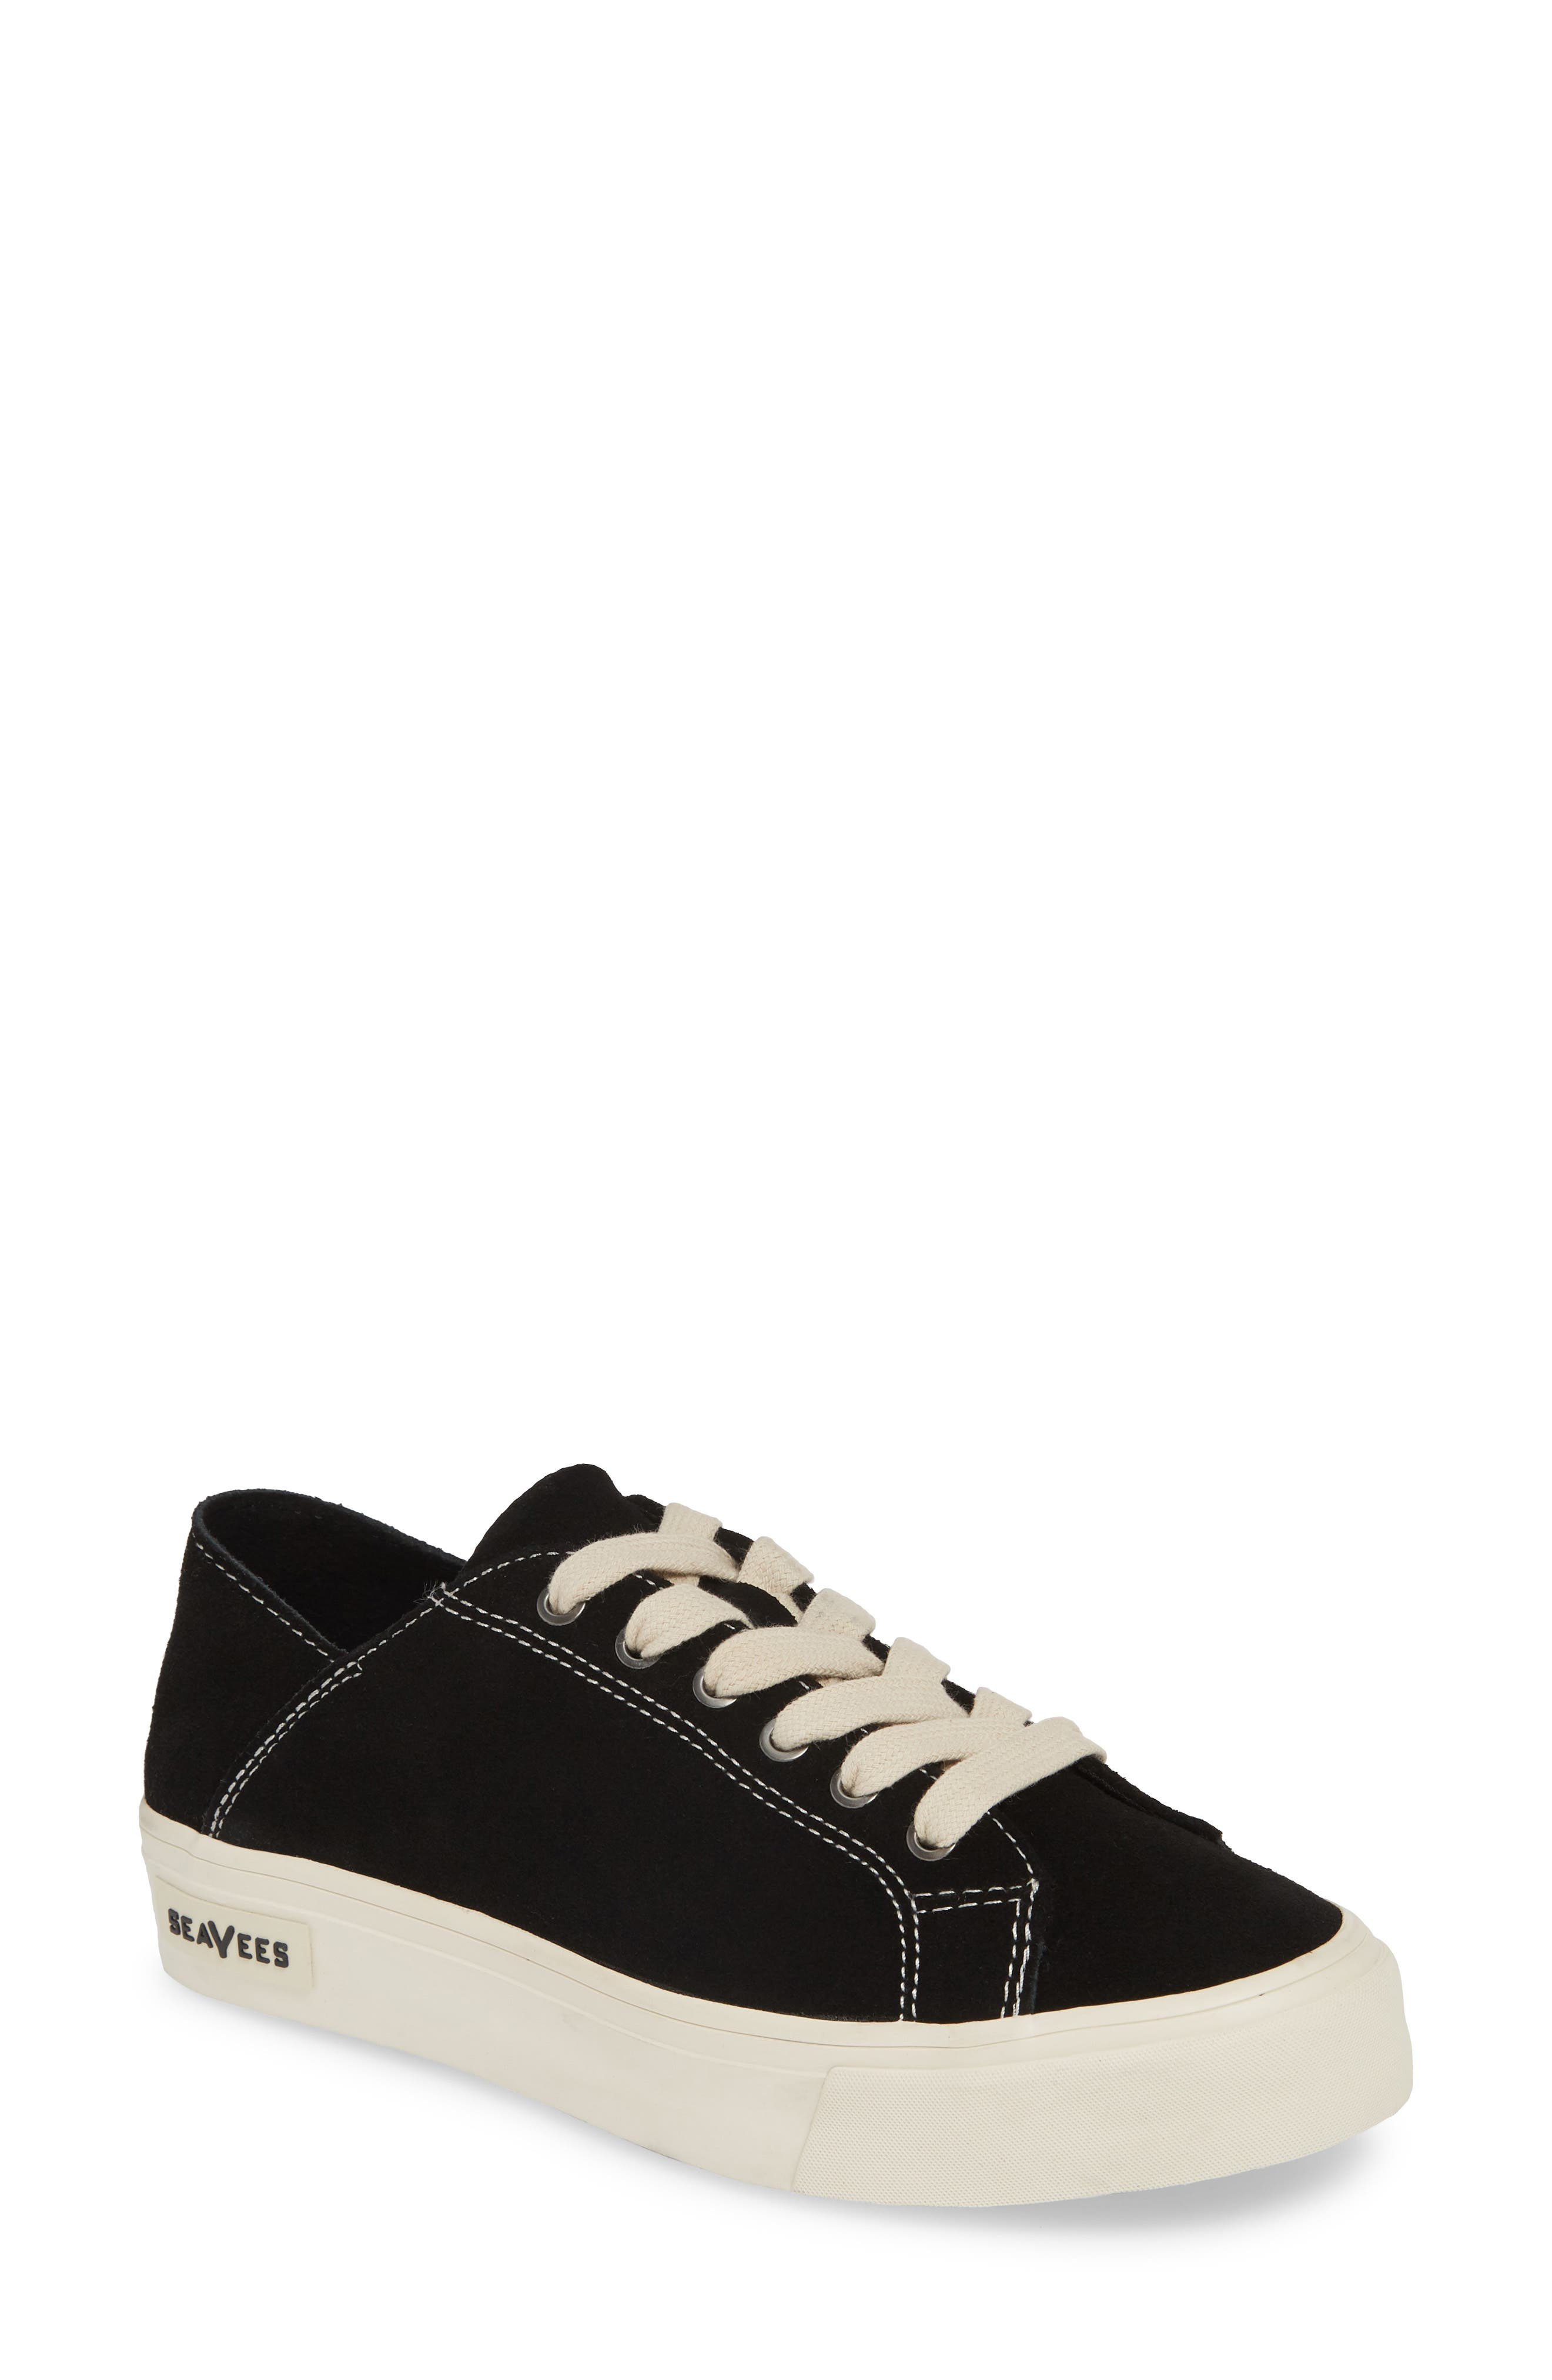 SEAVEES Sausalito Sneaker, Main, color, BLACK/ BLACK